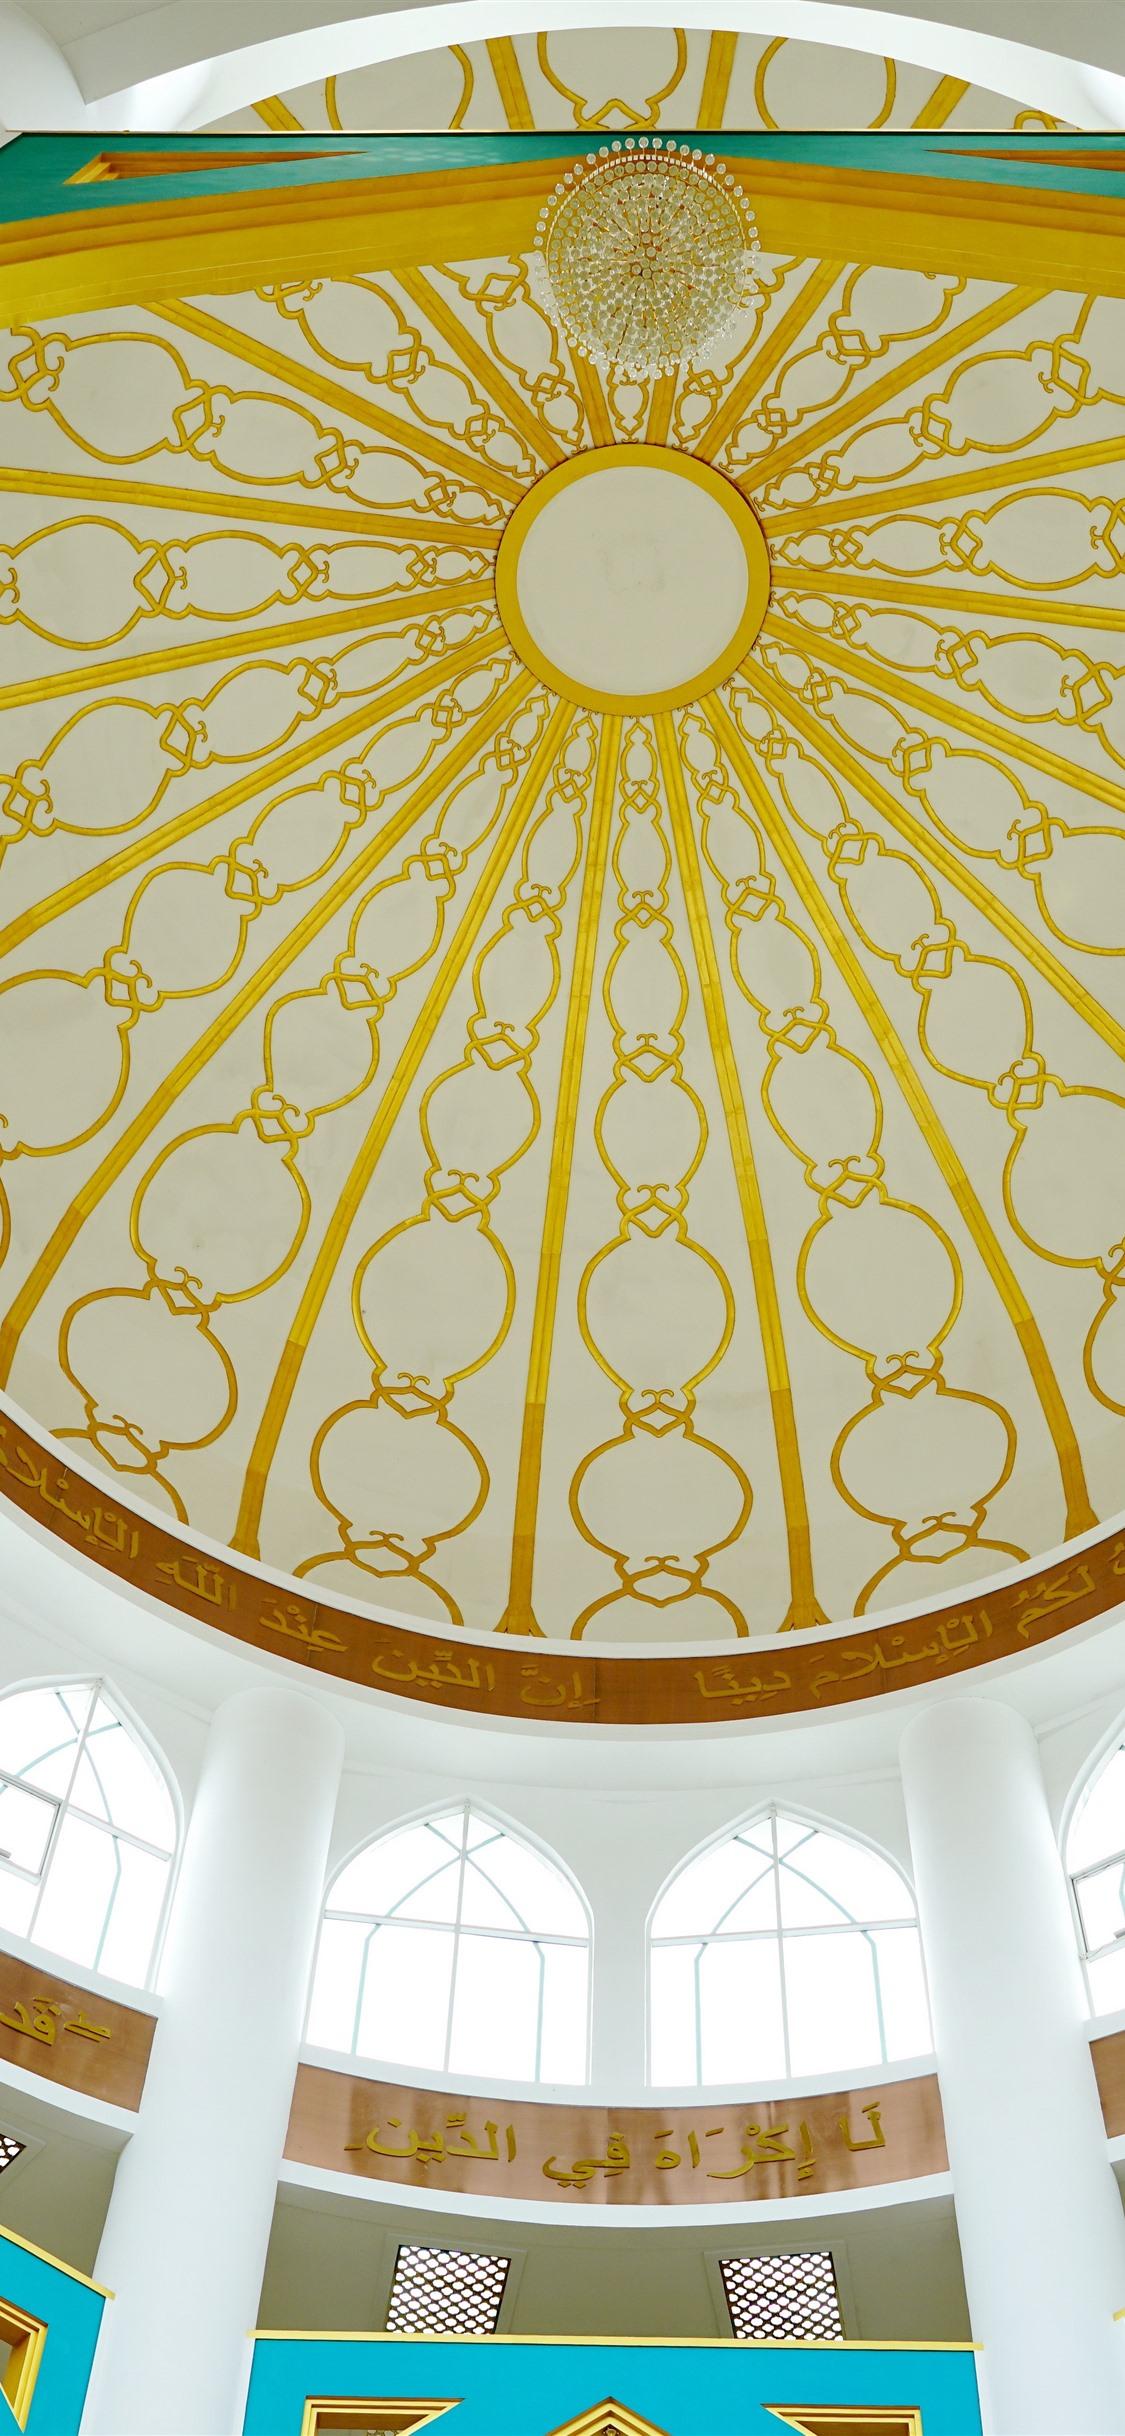 Islamic Church Dome 1125x2436 Iphone Xsx Wallpaper